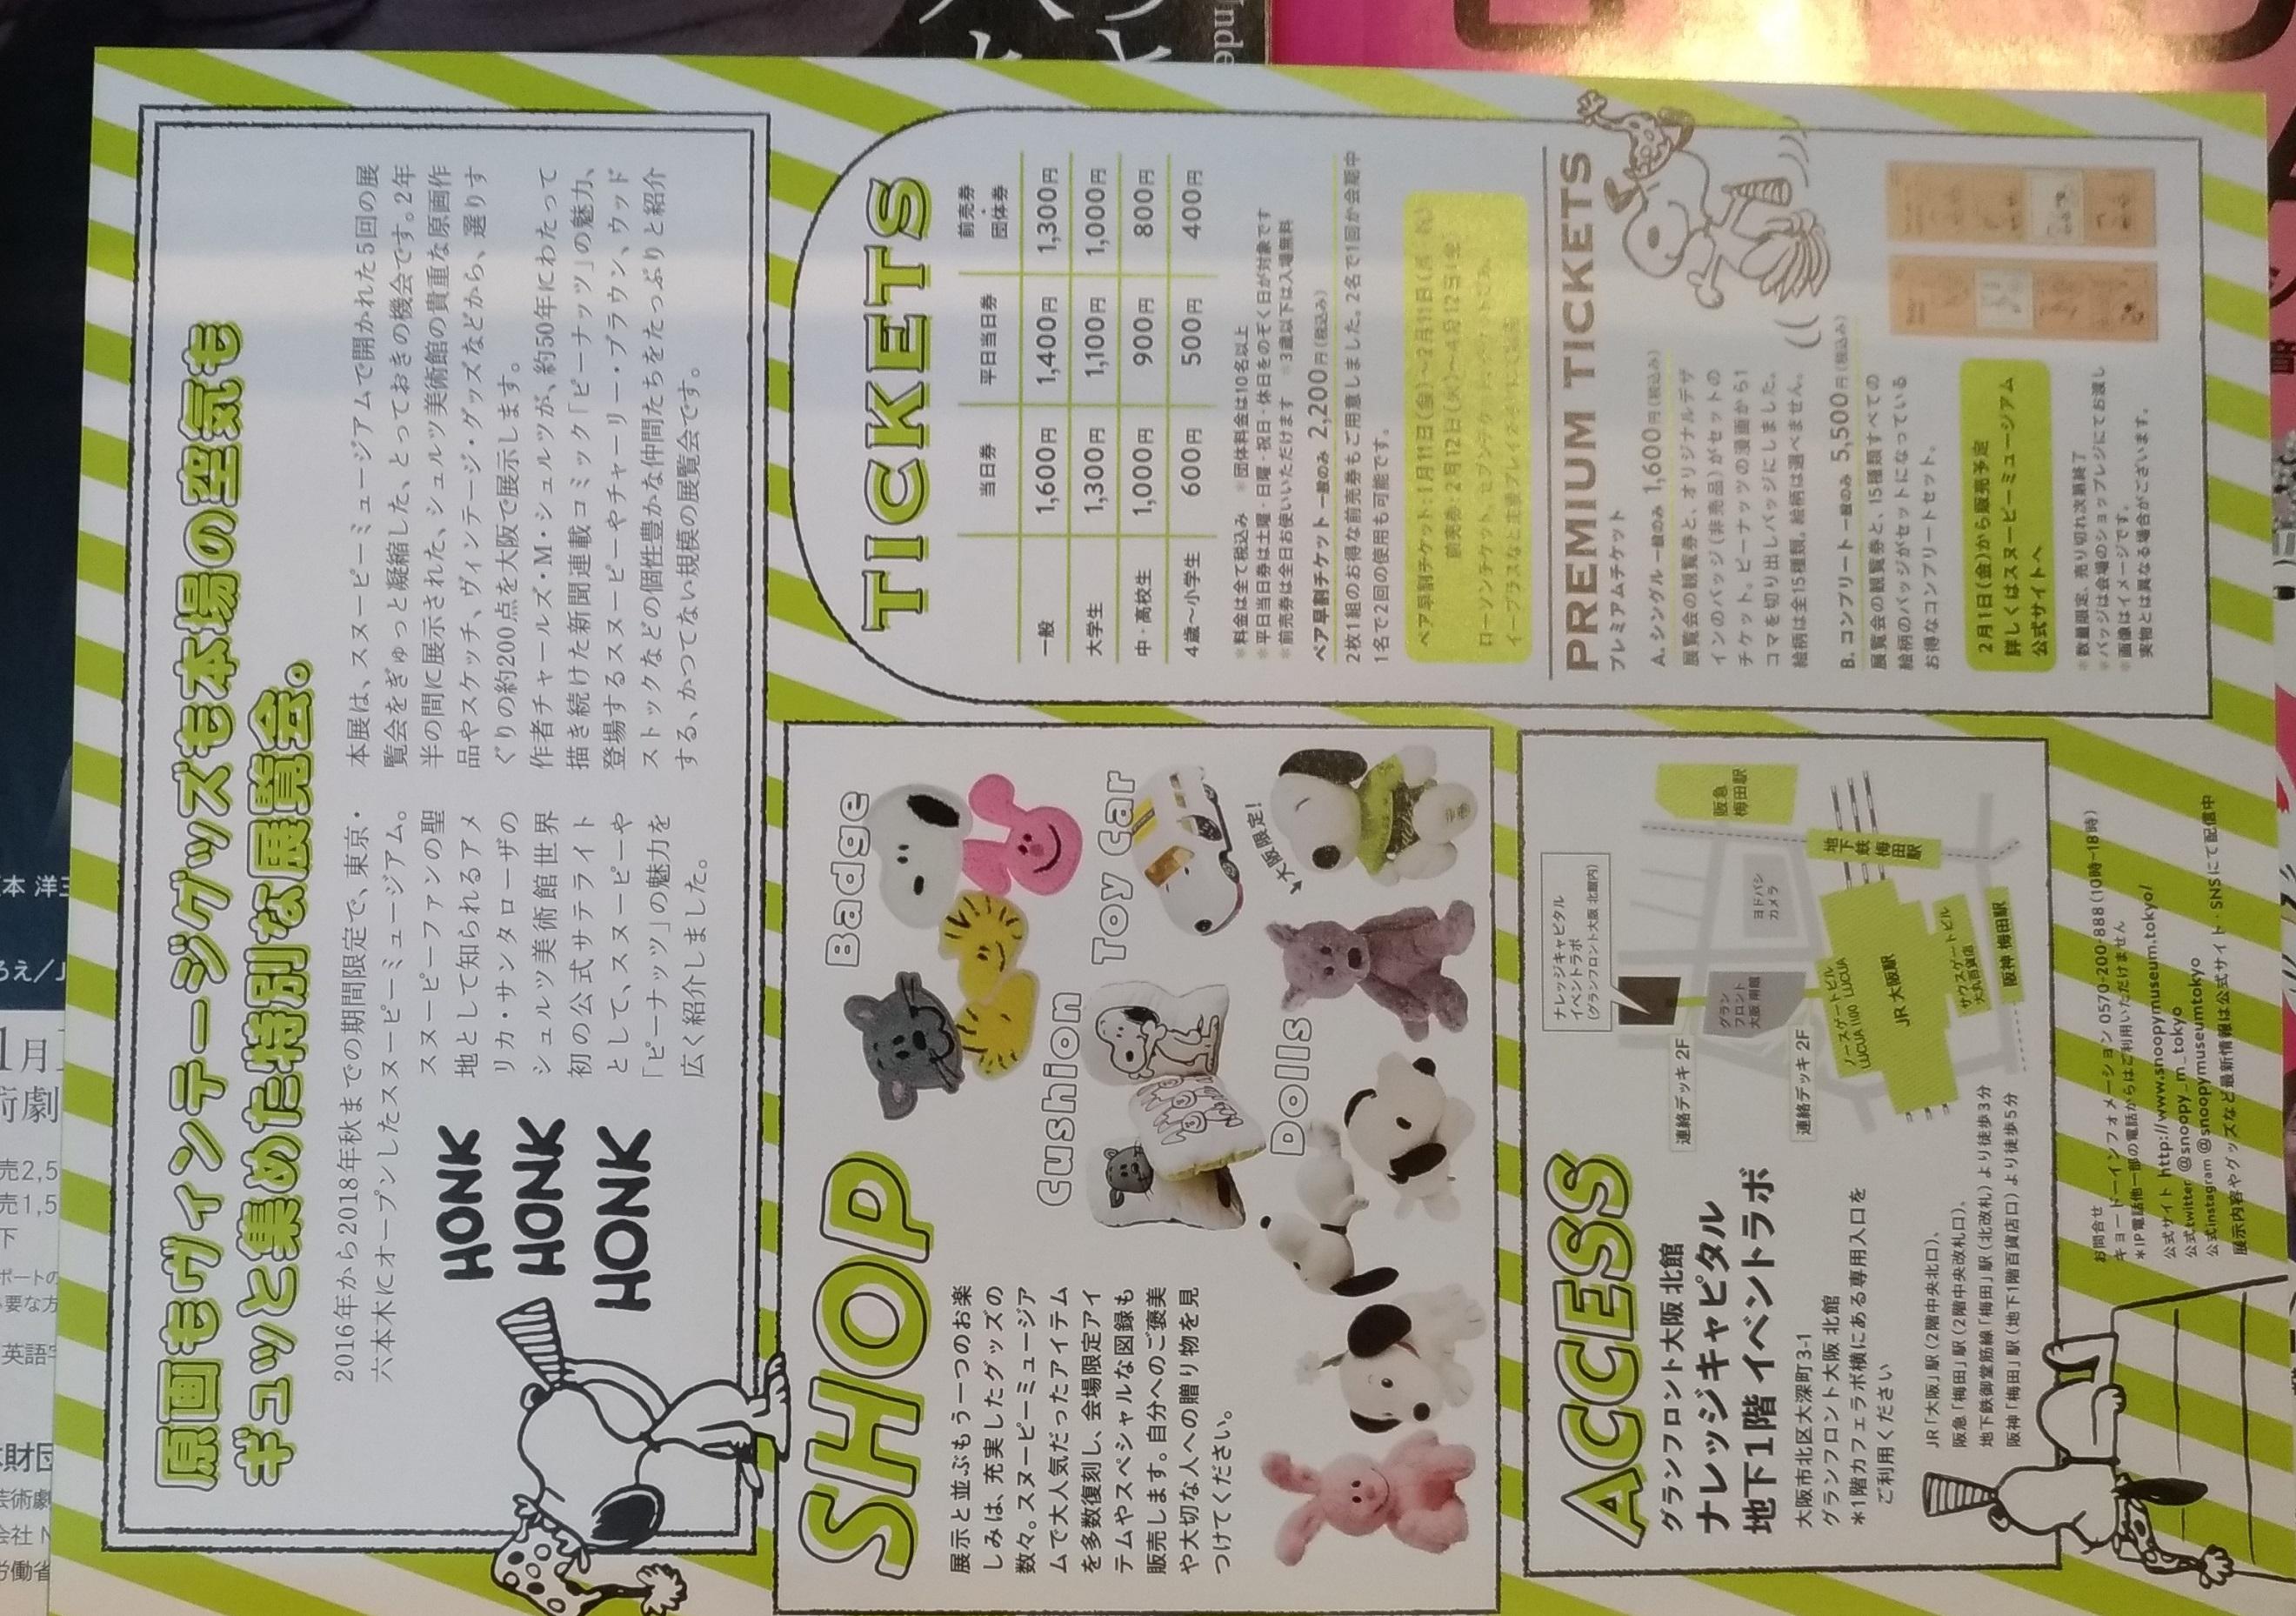 osaka_umeda_snoopy_granfront1.jpg